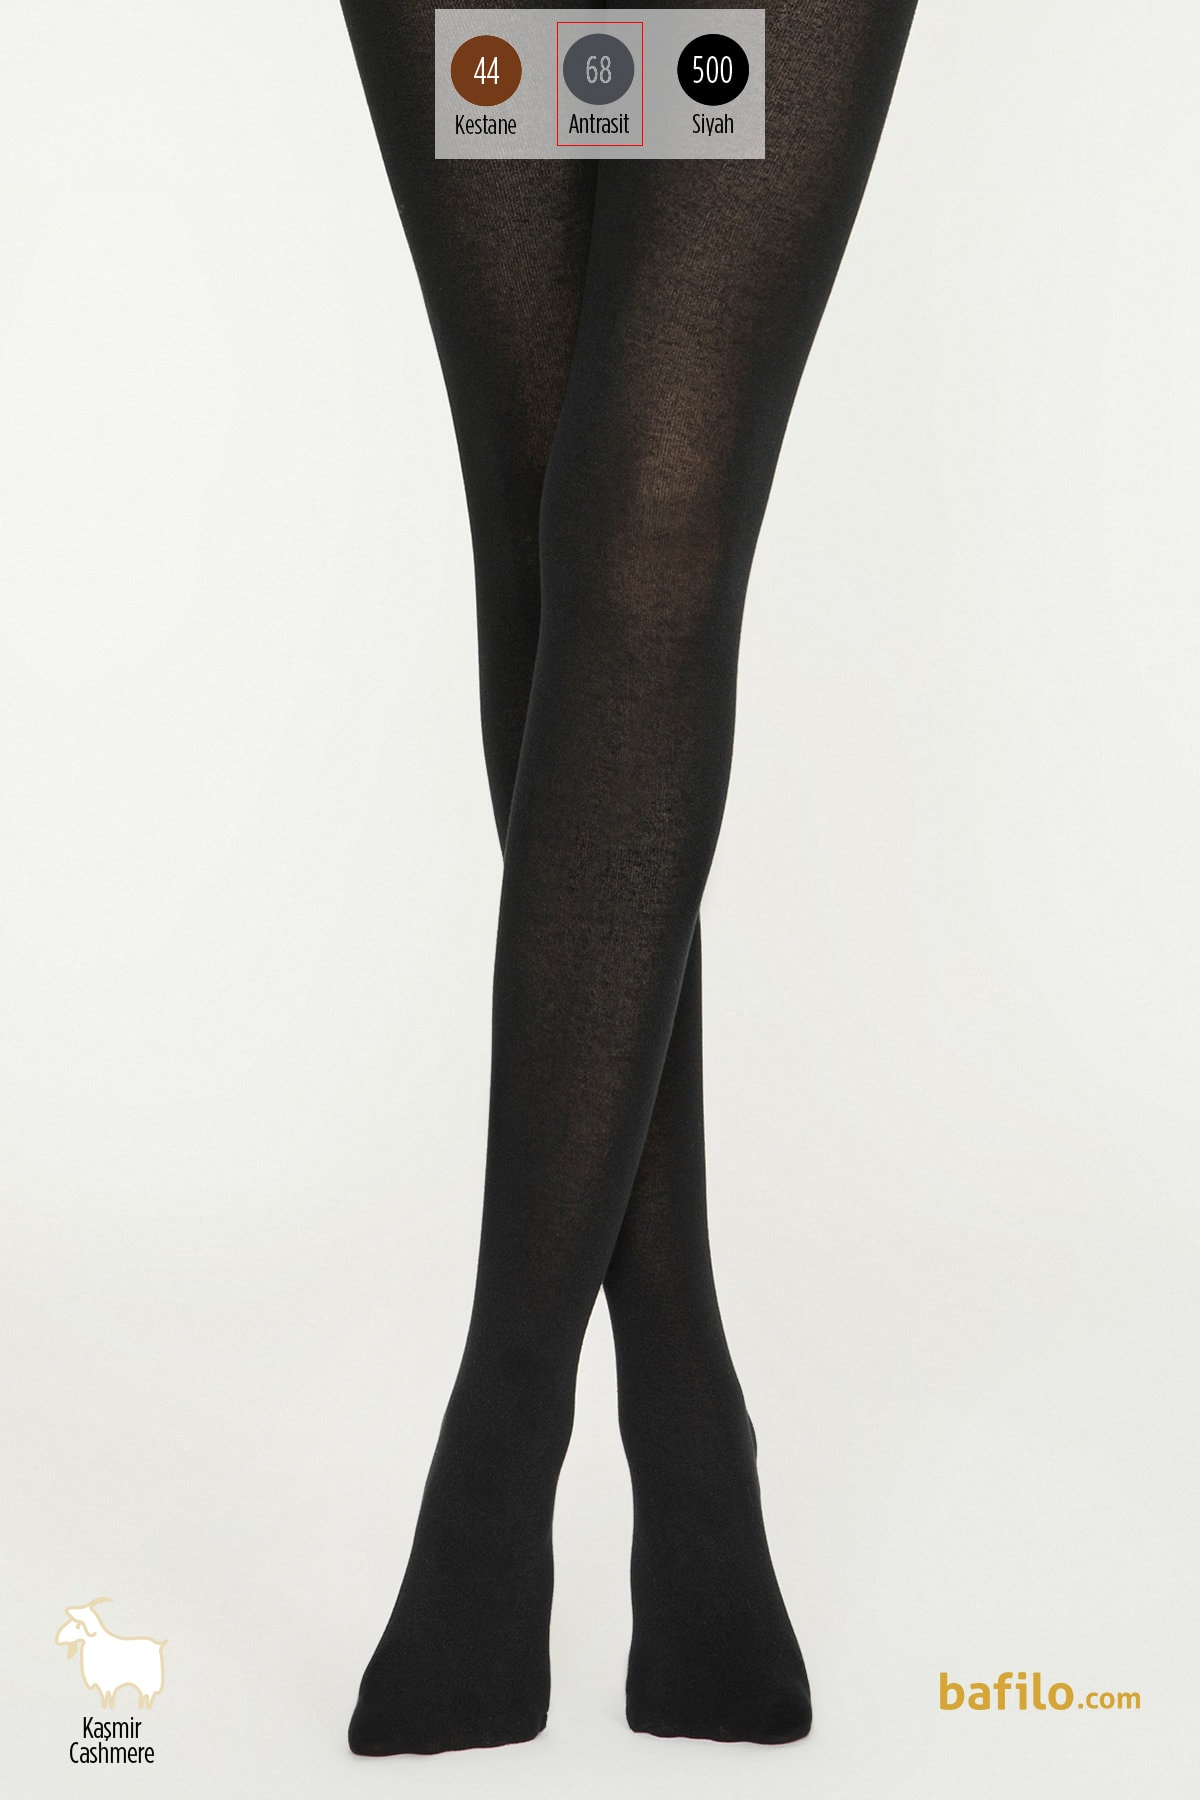 پنتی | Penti - جوراب شلواری کشمیر زنانه Penti زغالی